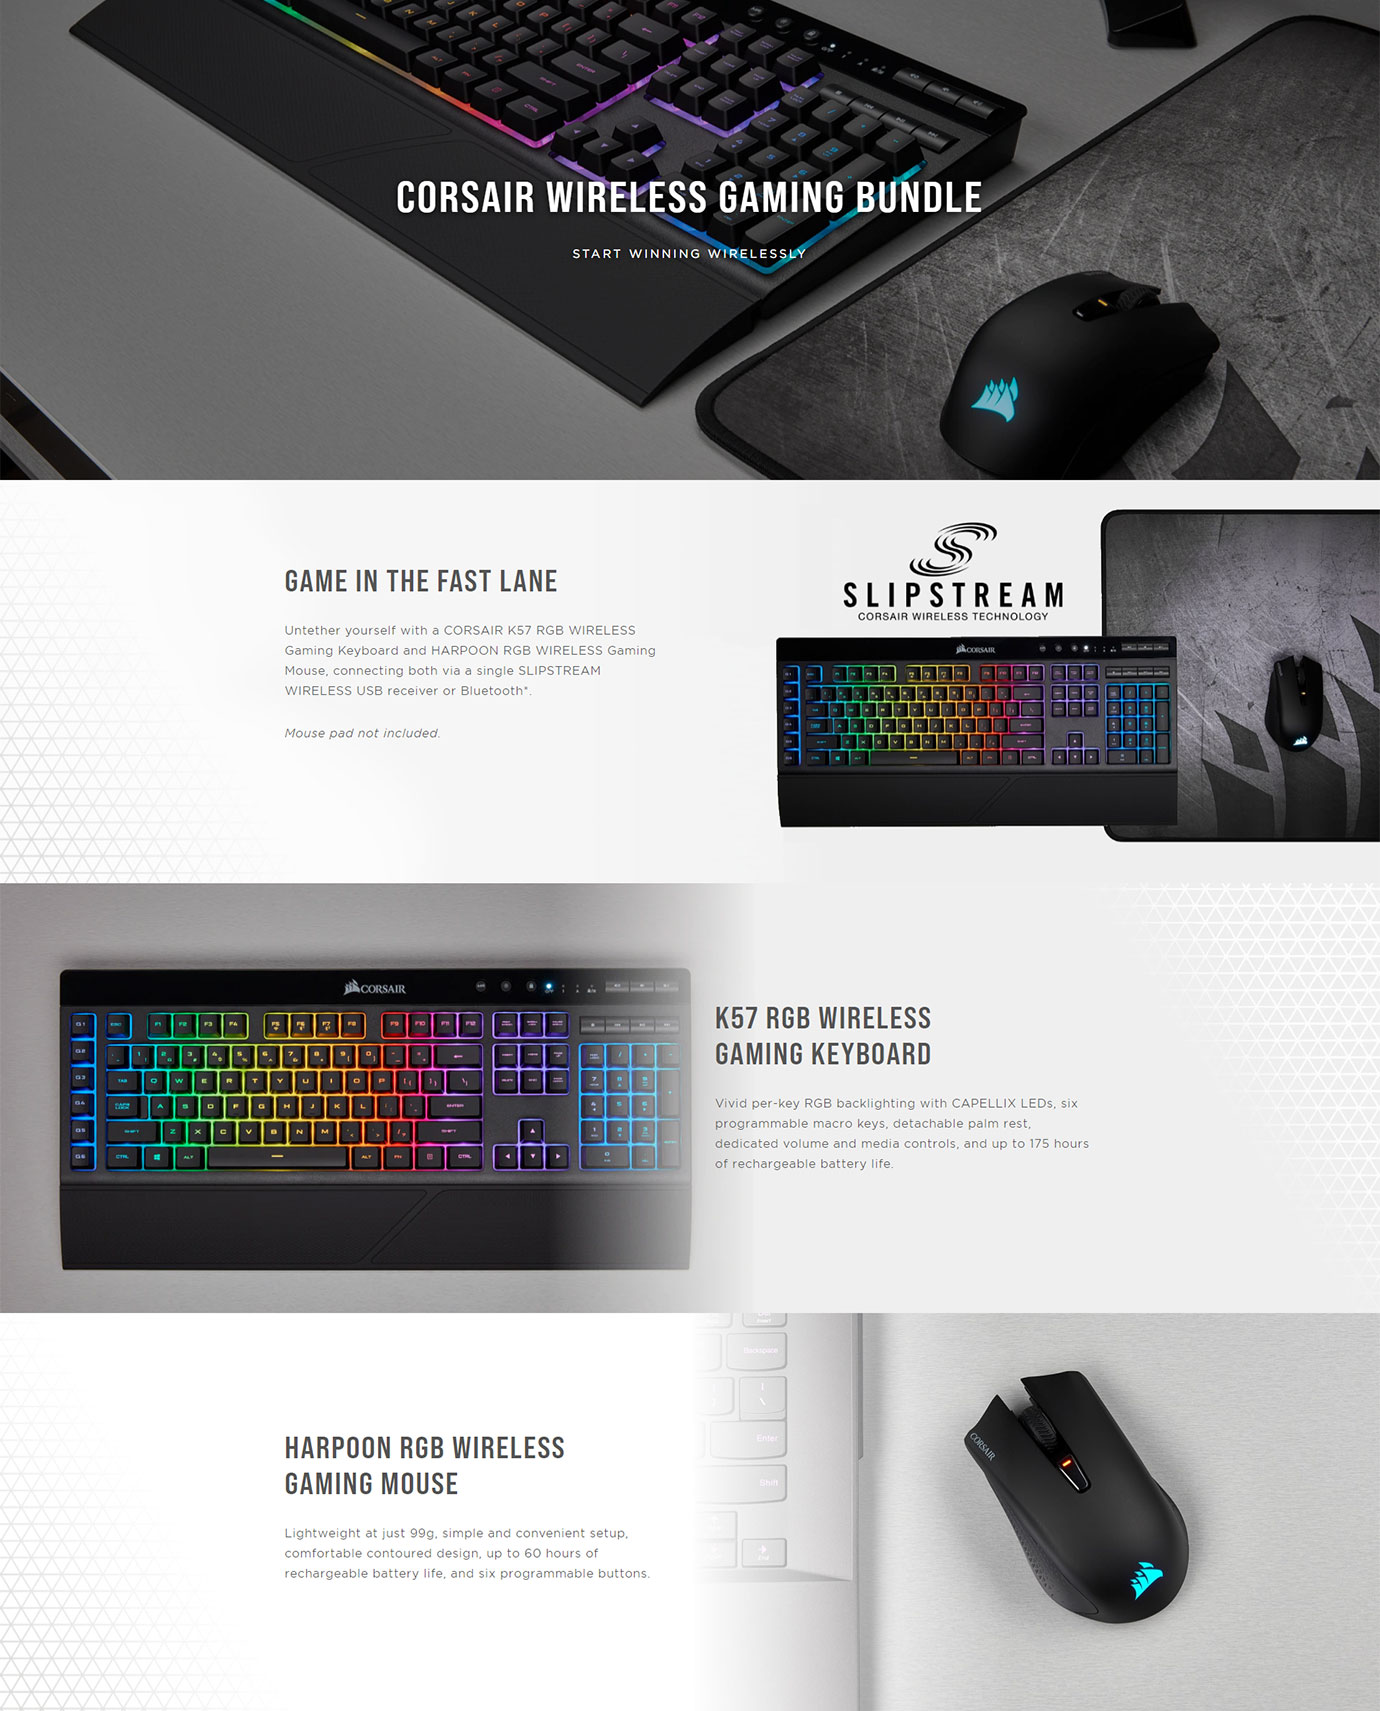 Corsair K57 Keyboard with Harpoon Mouse Gaming Bundle